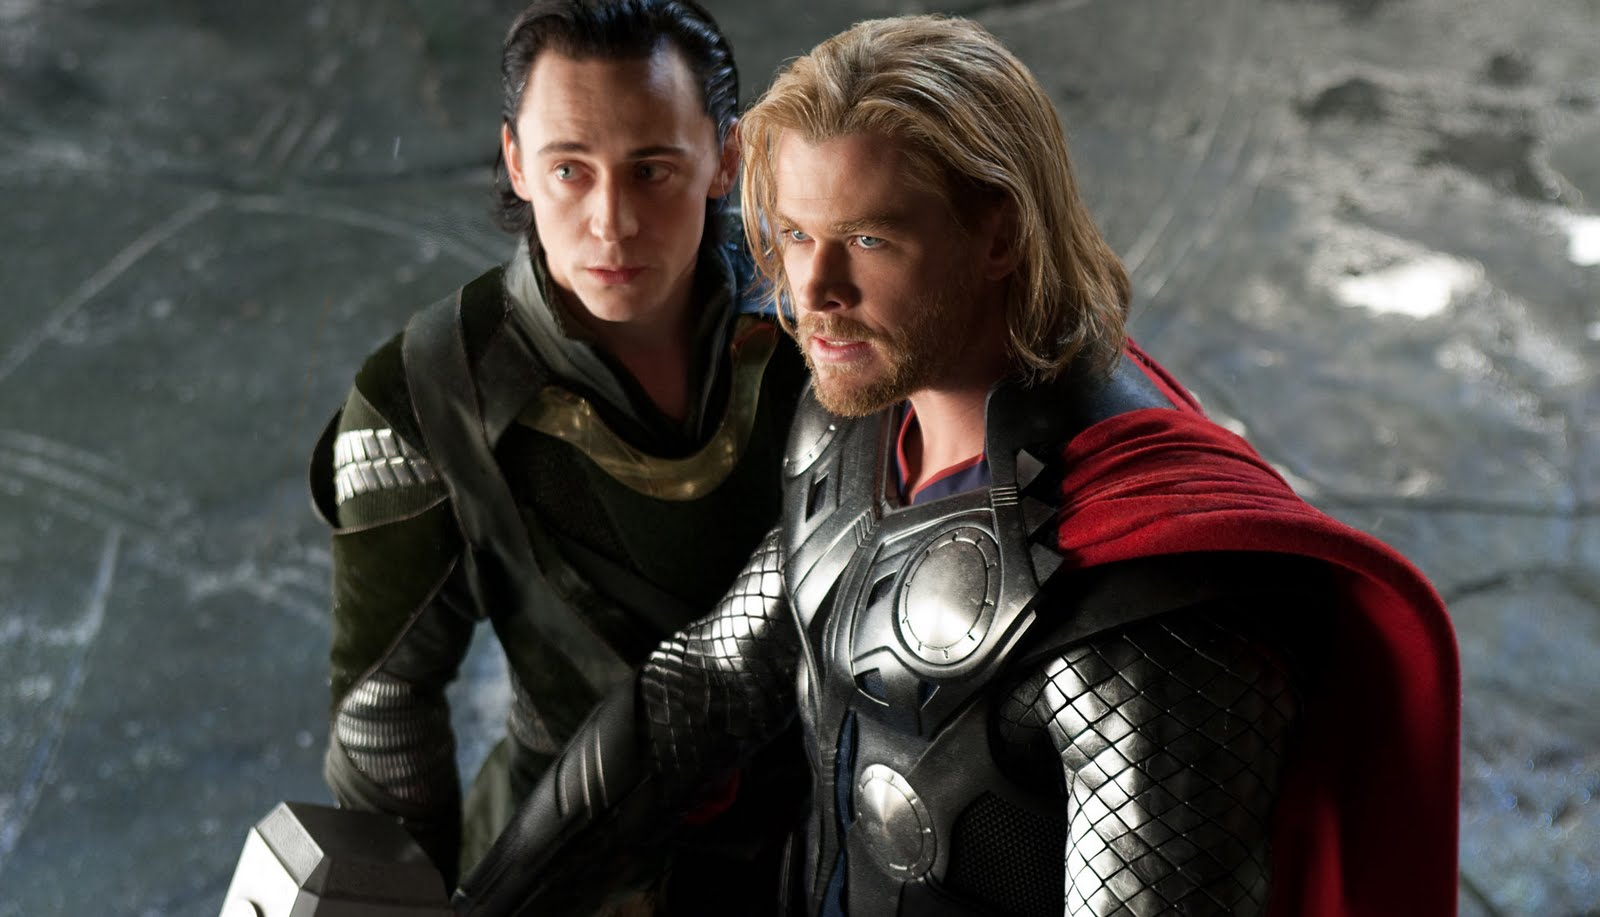 http://2.bp.blogspot.com/-i8kDb40zg-g/TjgAaRcugfI/AAAAAAAAATQ/WbqhsXcm95c/s1600/Loki-Thor-Movie-Wallpaper-4.jpg